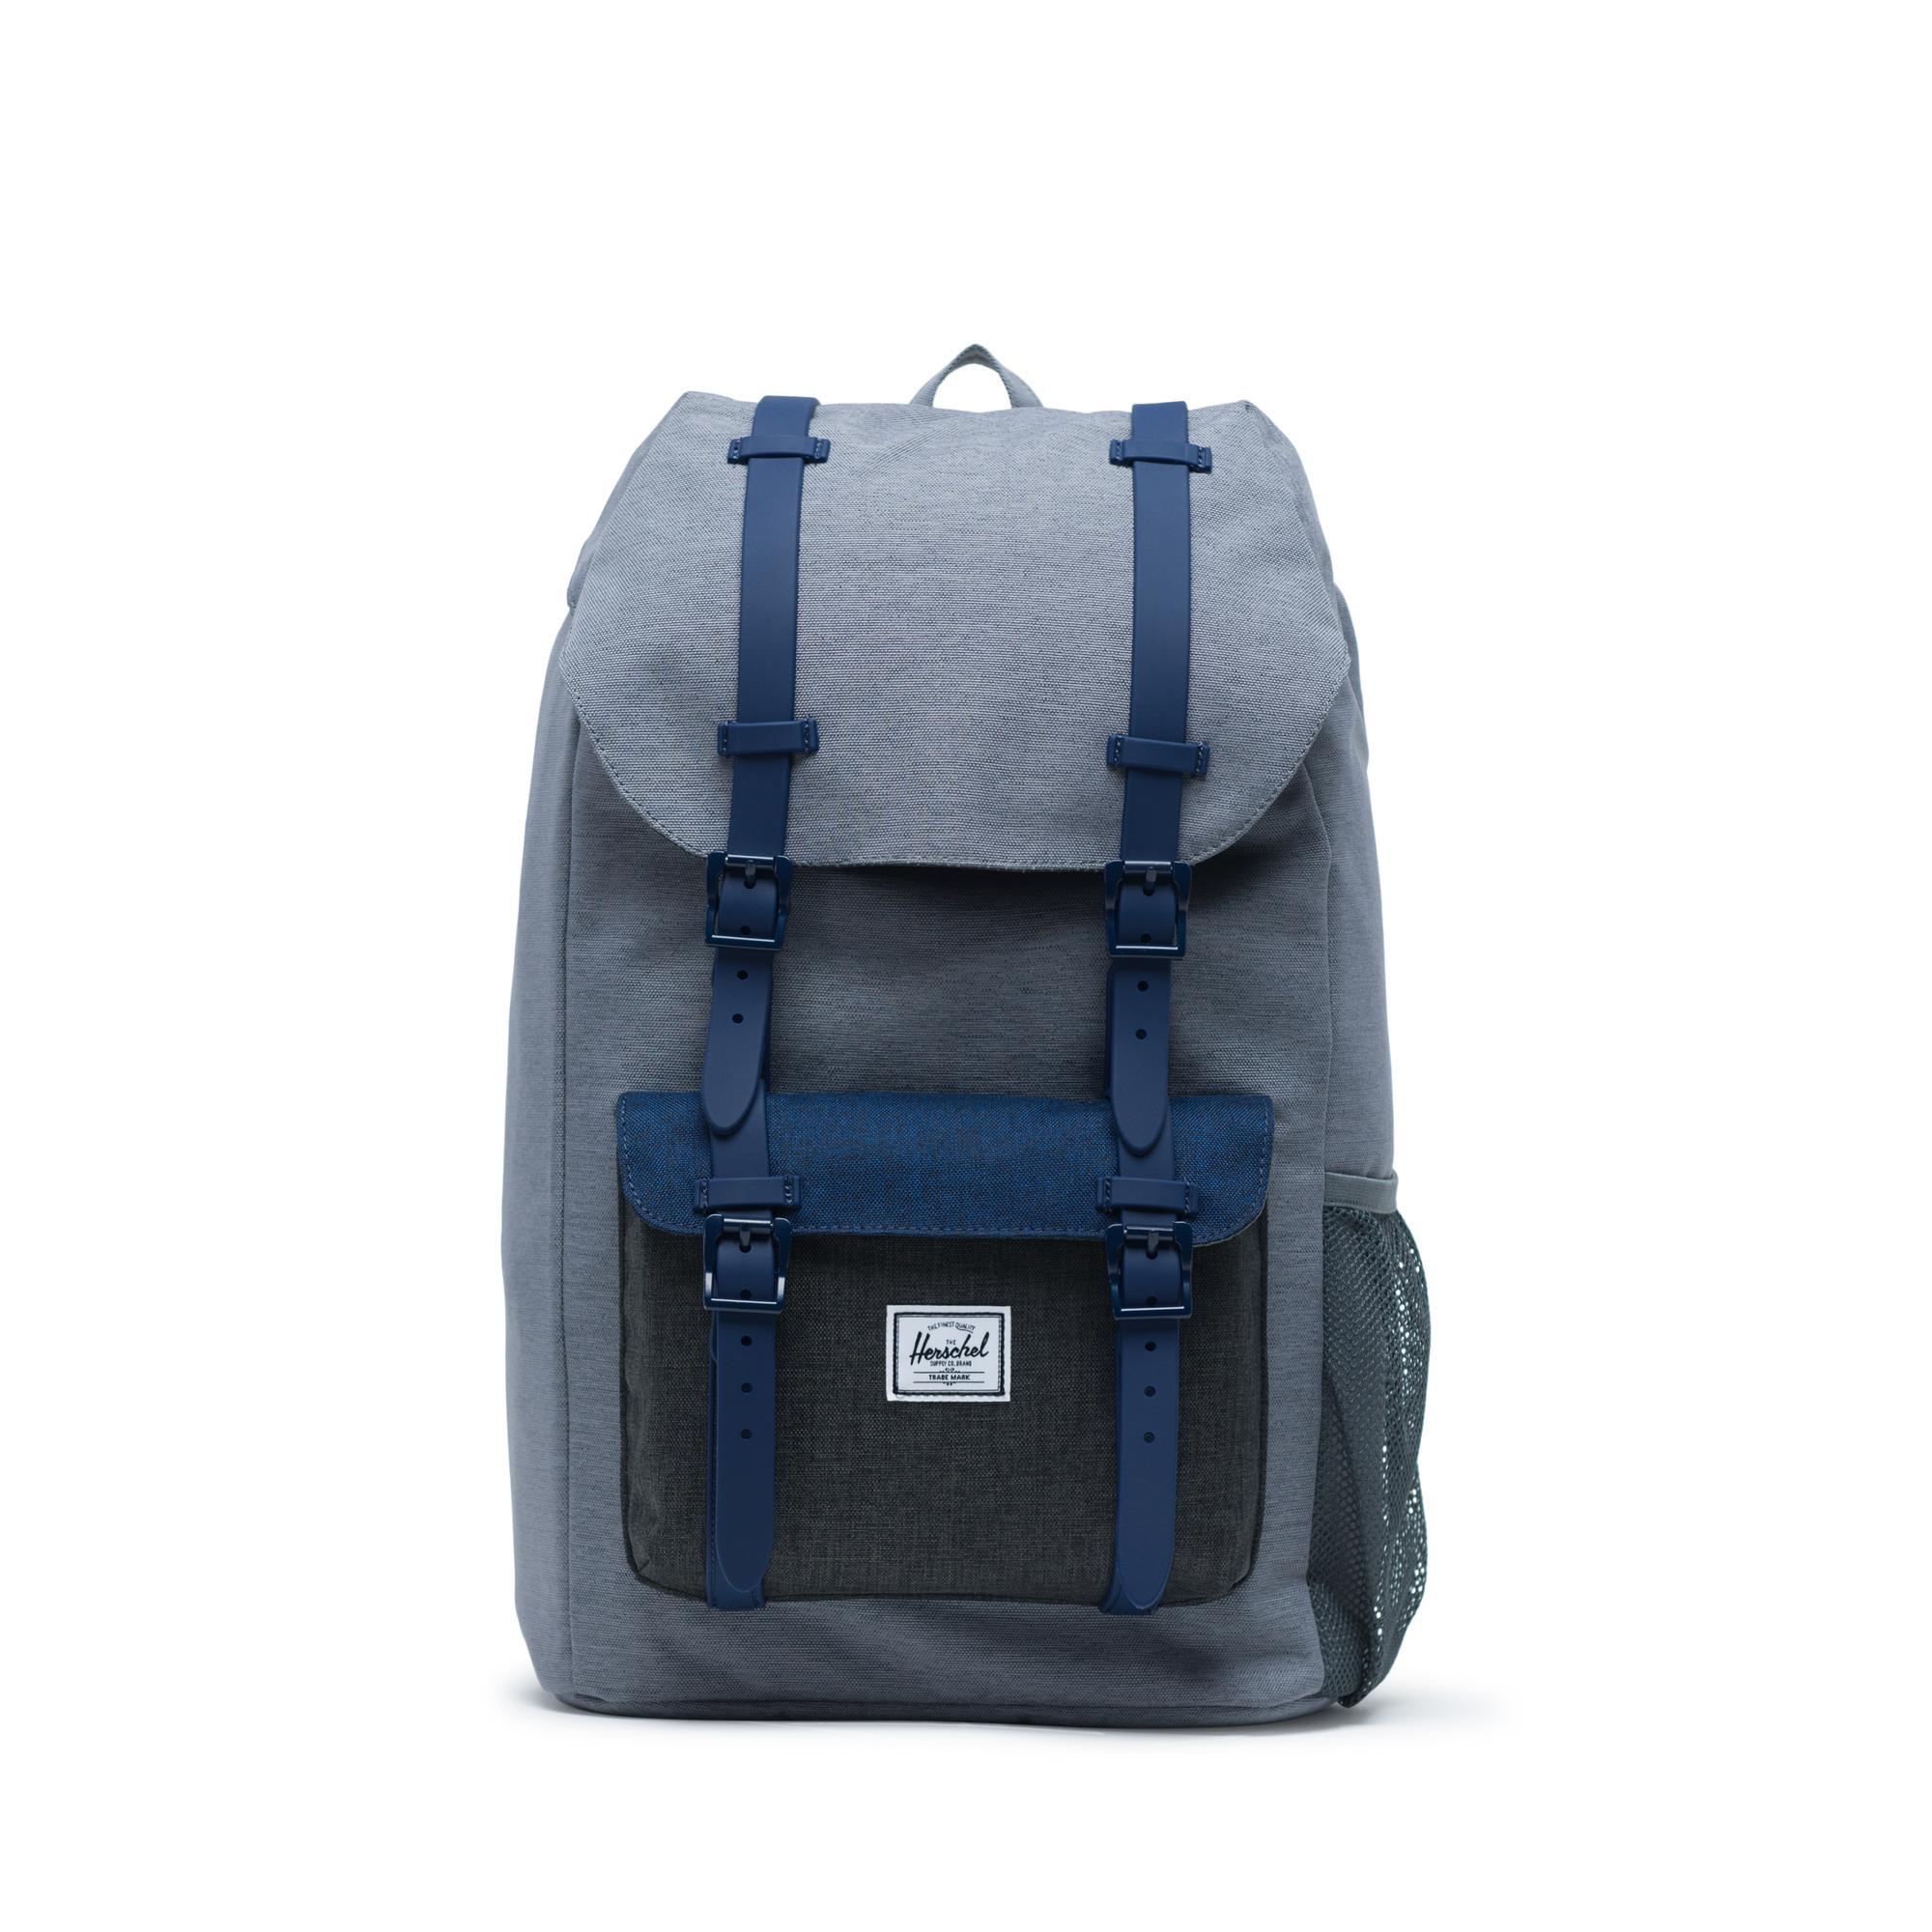 Herschel Kids Little America Flapover Backpack Medival Blue// Light Grey